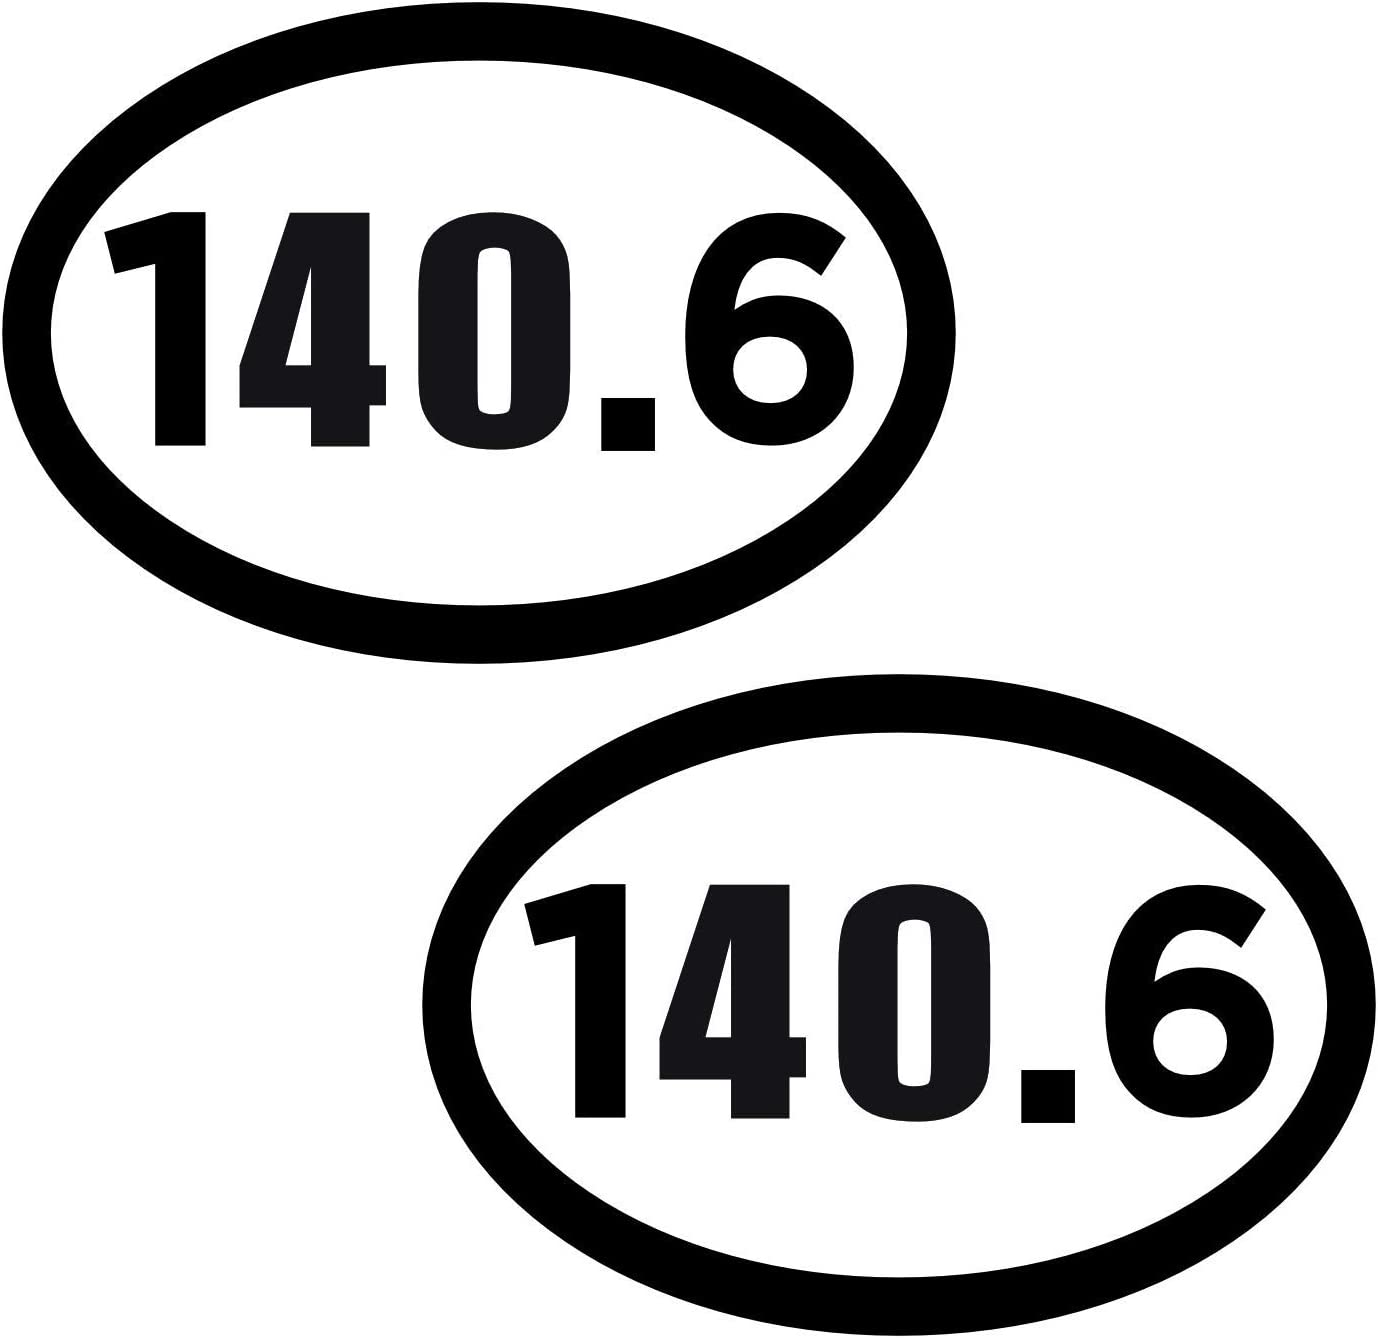 1 Magnet 4x6 Oval Automobile Magnet Heavy Duty UV Waterproof Artisan Owl 140.6 Full Ironman Triathlon White Oval Car Magnets